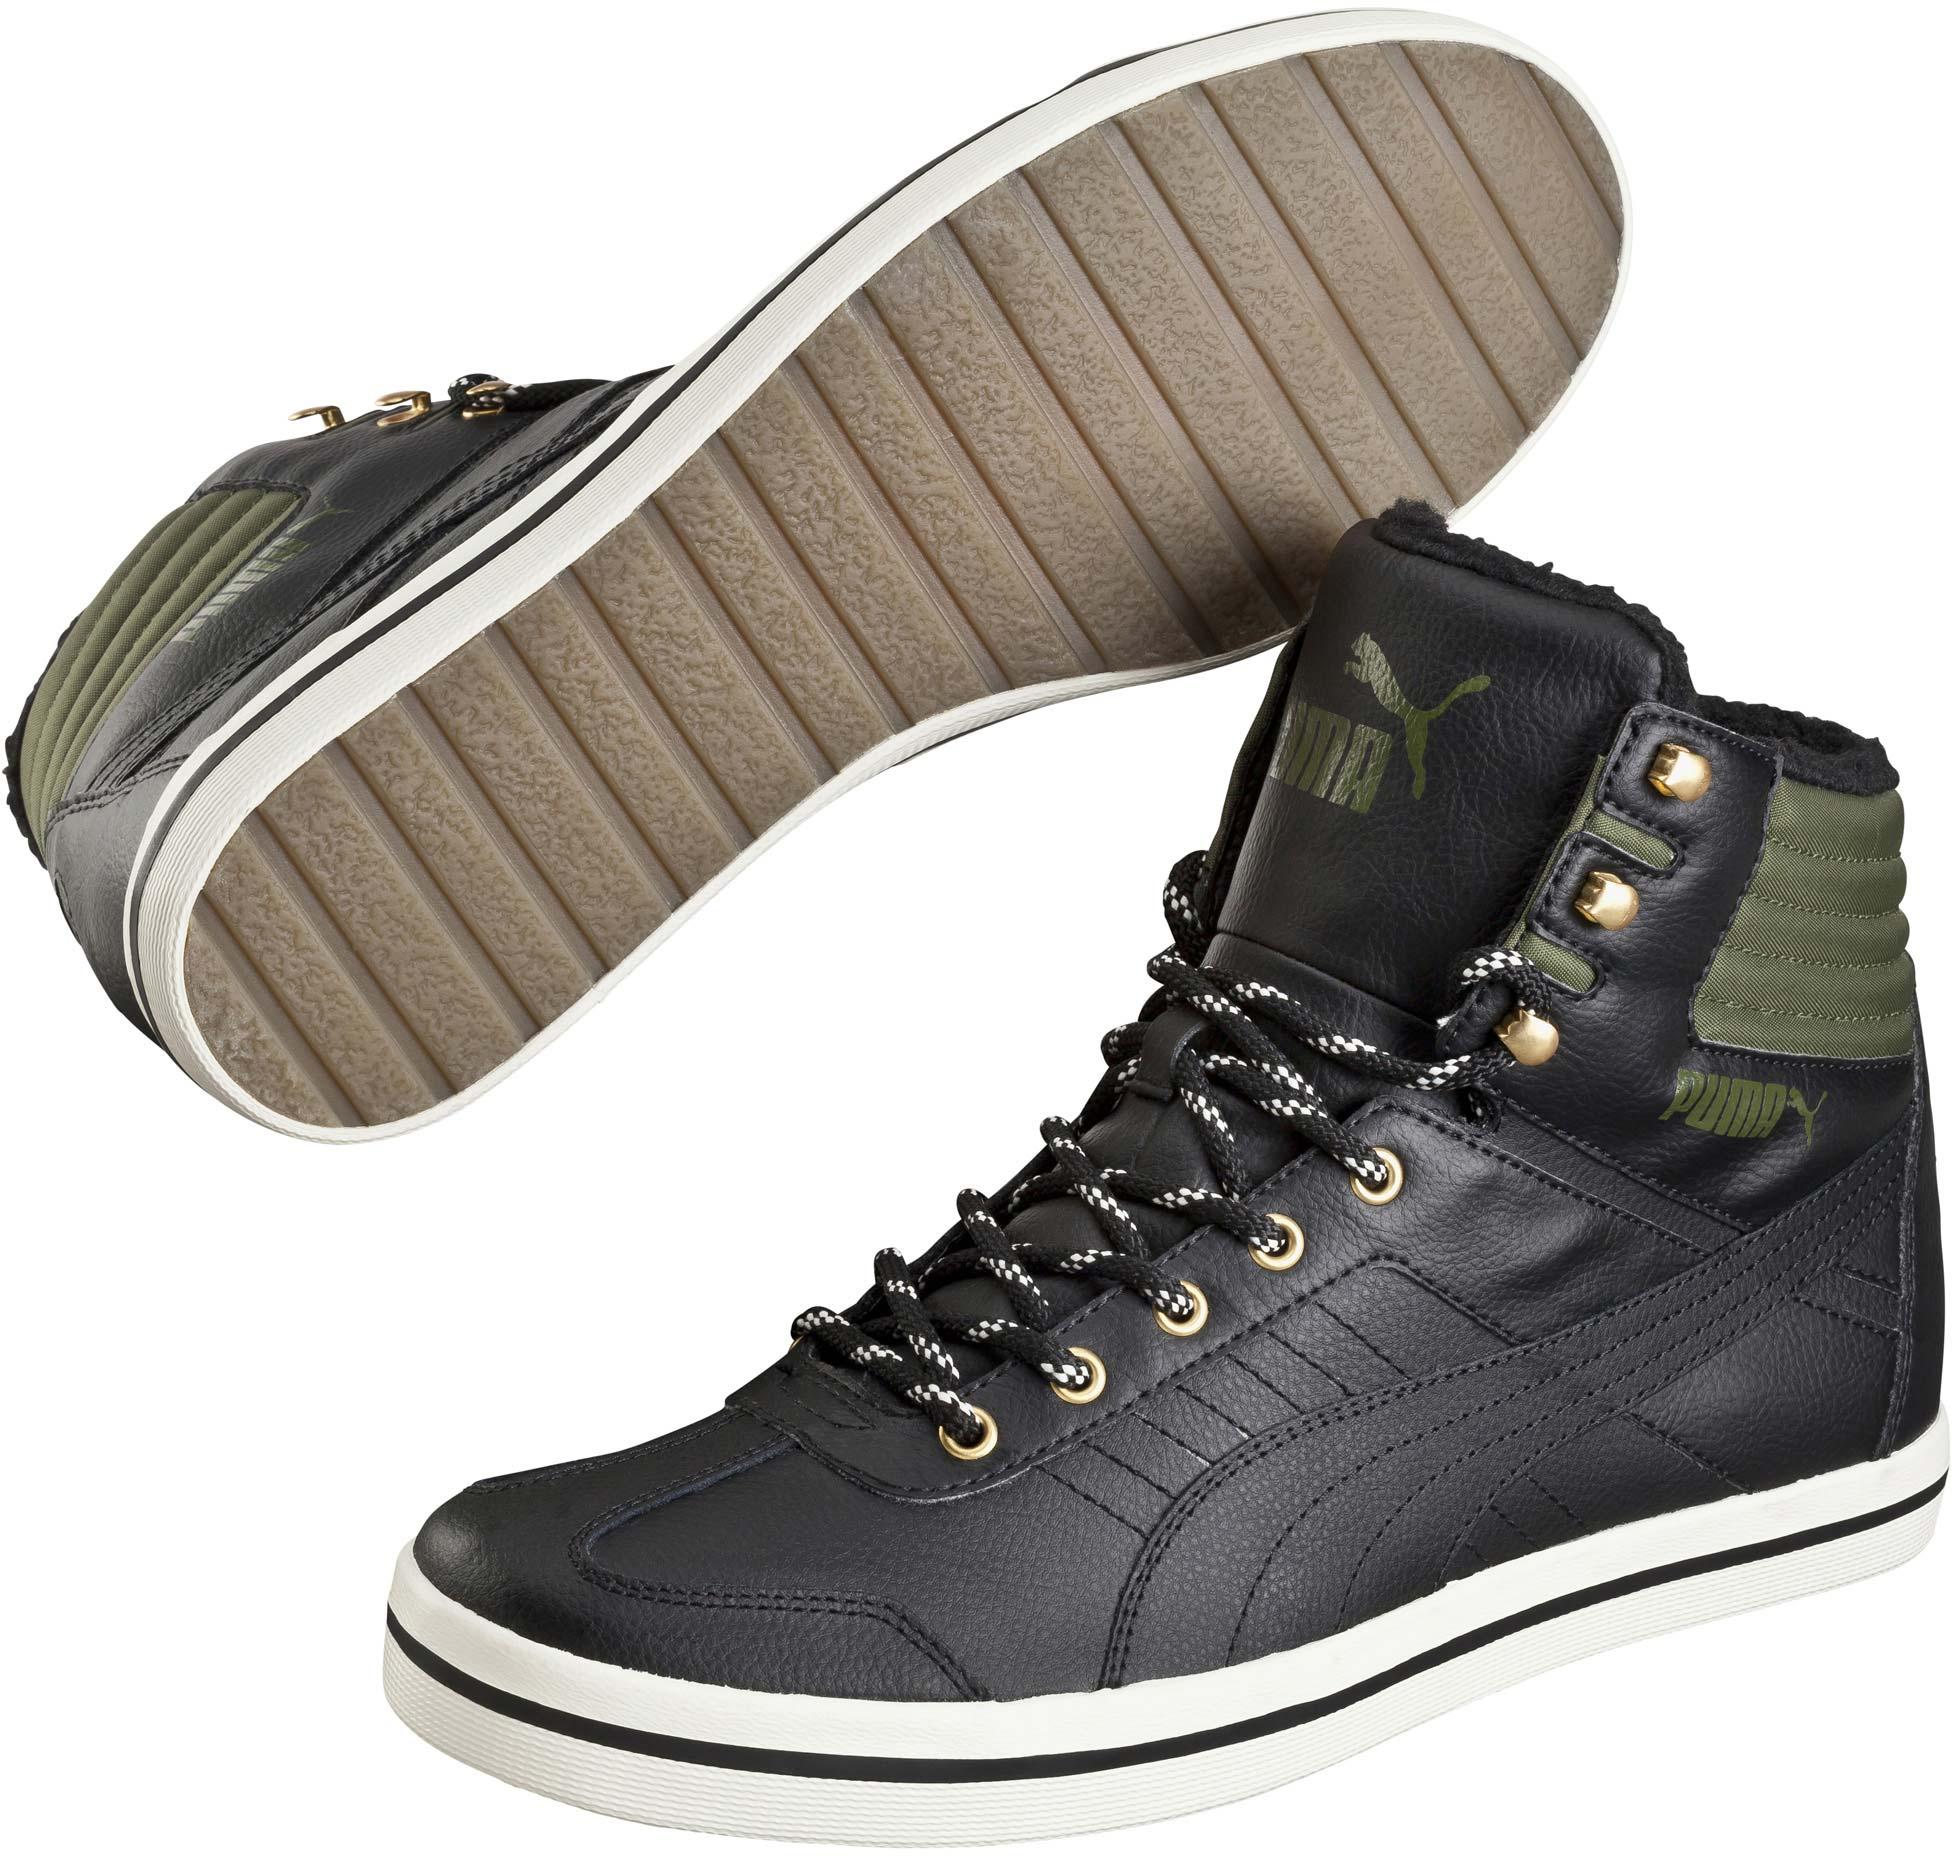 66a1981d42d83 TATAU SNEAKER BOOT - Pánske zimné topánky